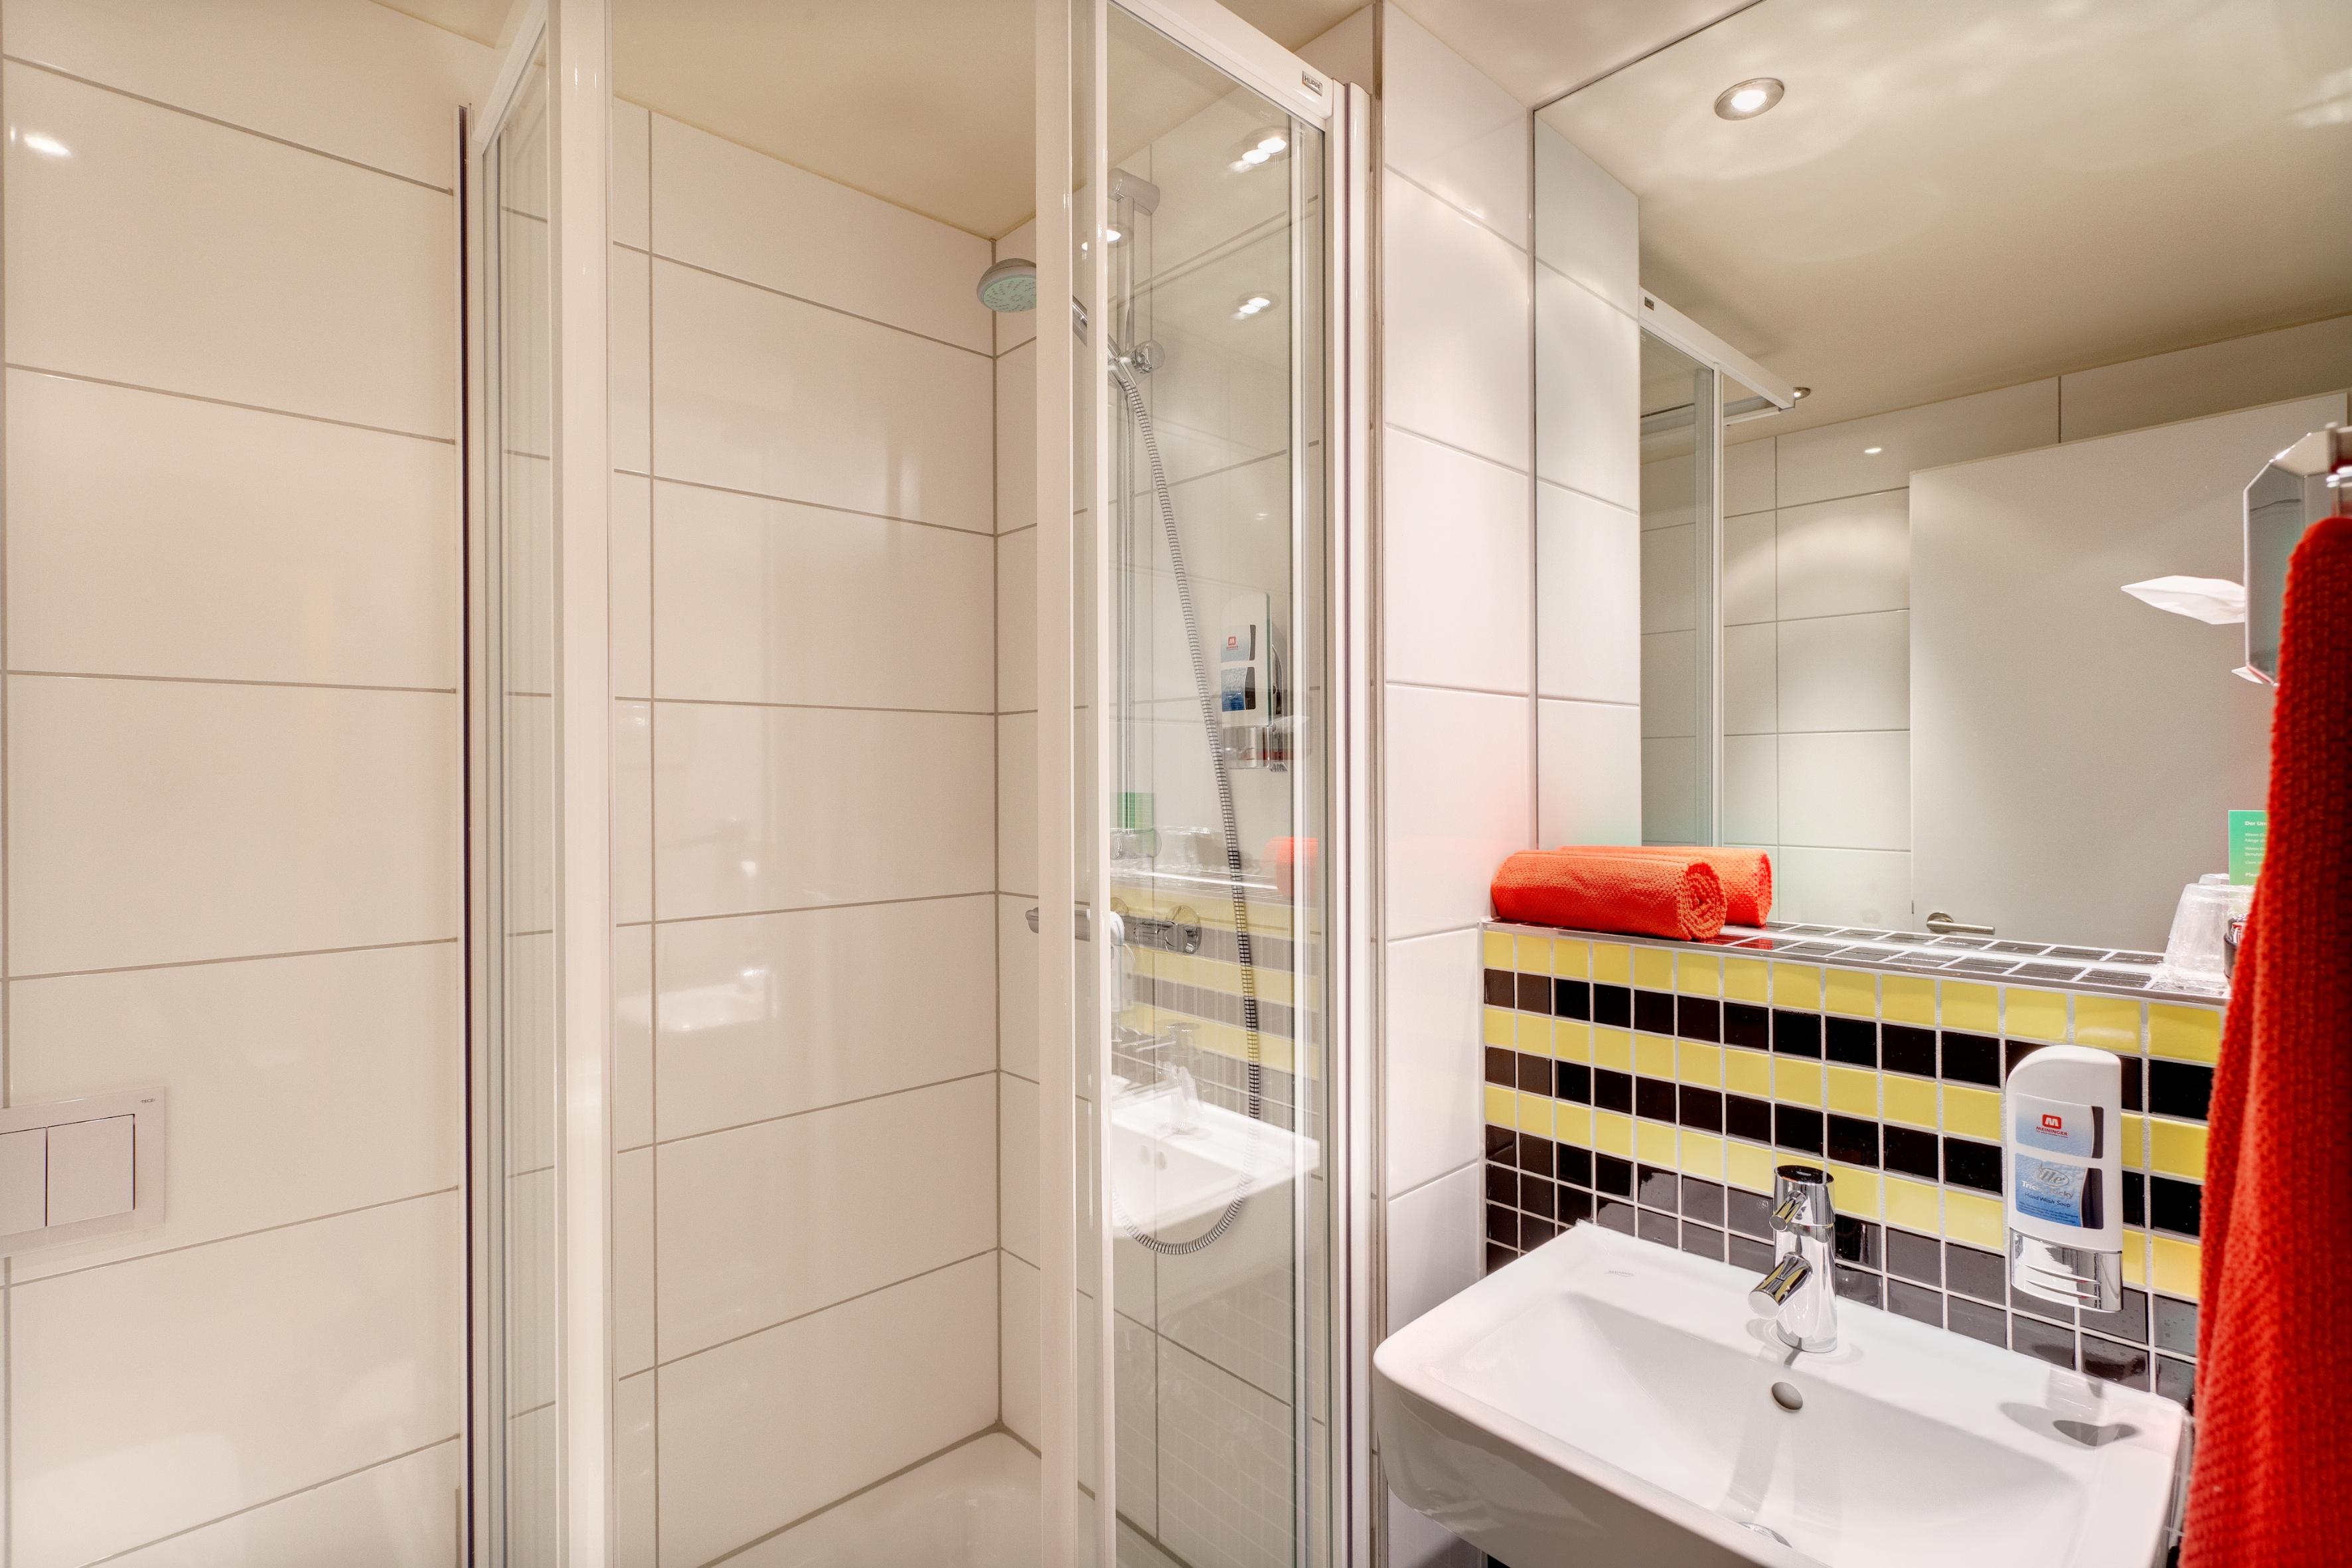 MEININGER Hotel Frankfurt/Main Airport - Multi-bed